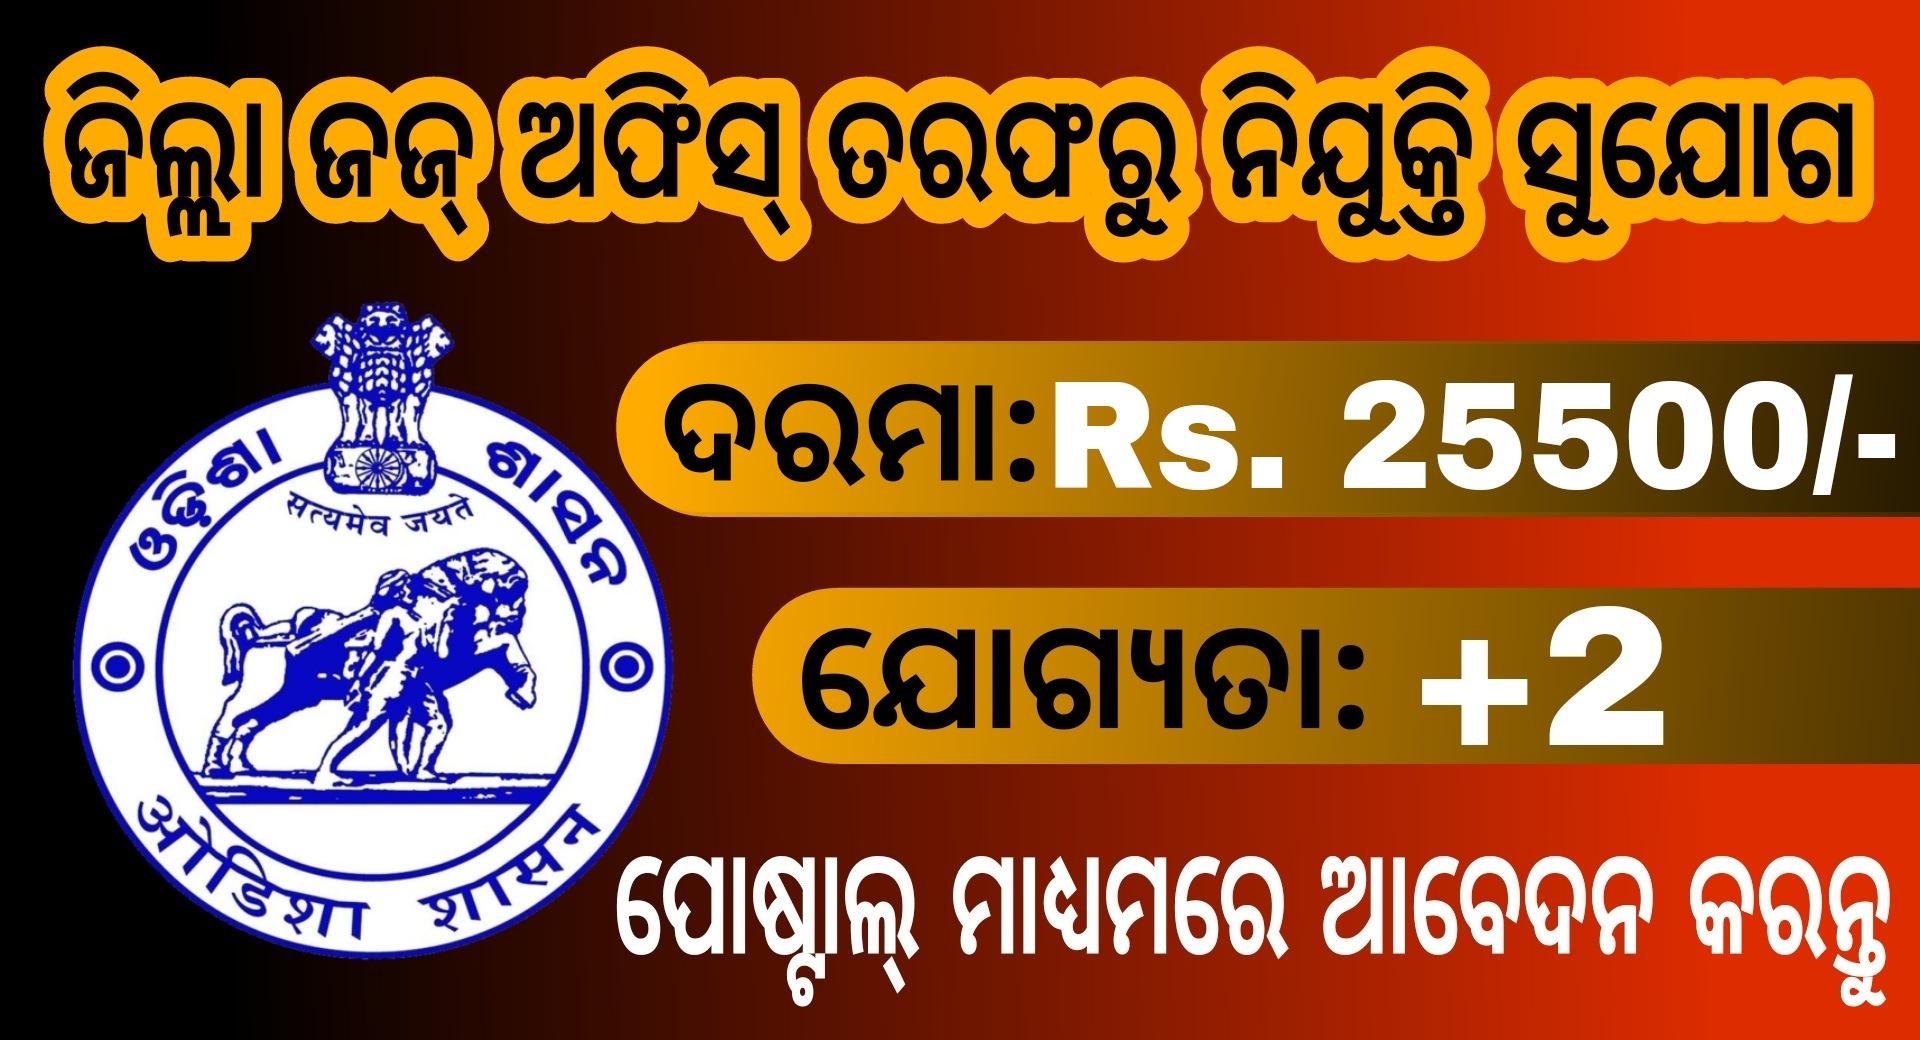 Puri District Judge Office Recruitment 2021 – Jobs in Odisha